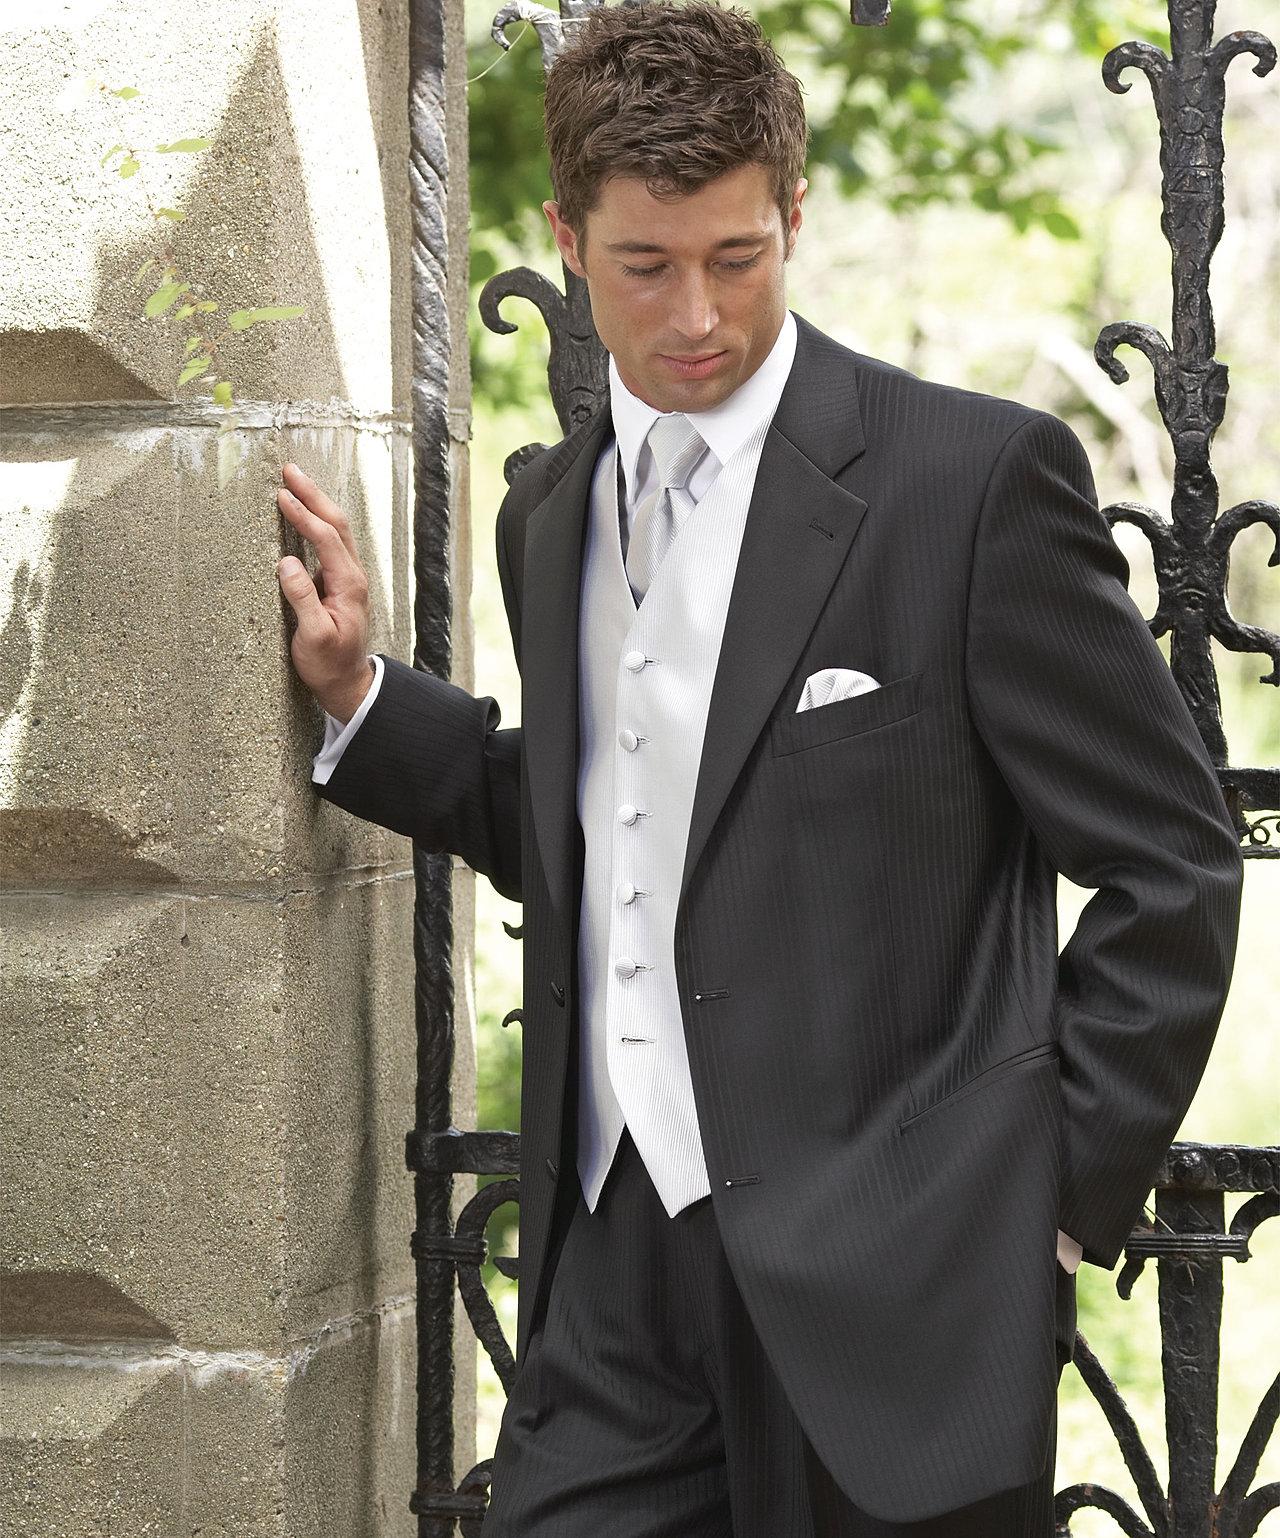 Tuxedos By Santostuxedosformalwearrentalssuitstuxedo Rentals